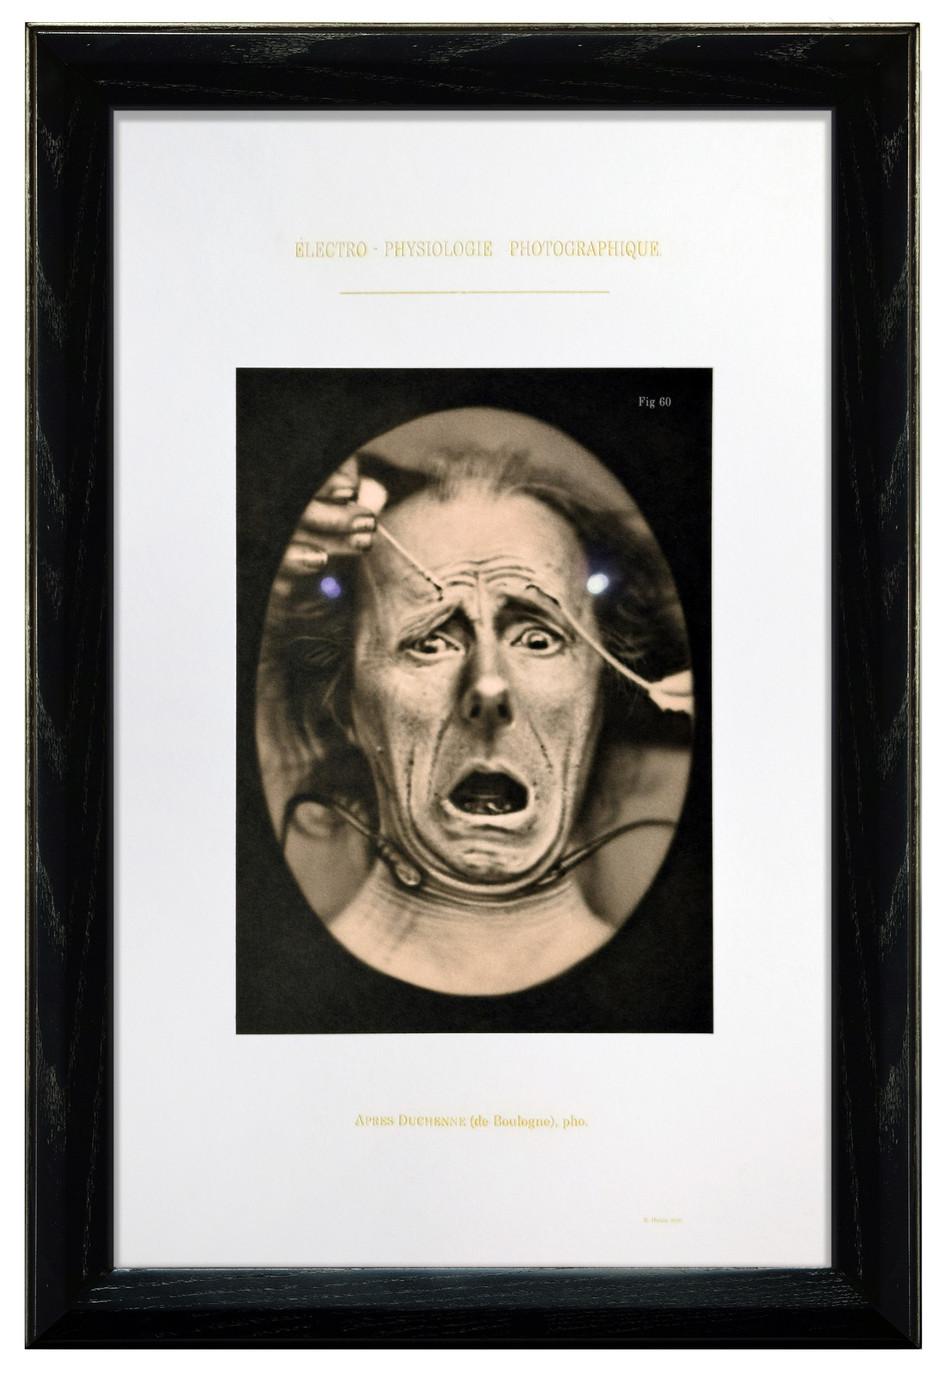 Figure 60: Fright, 2015